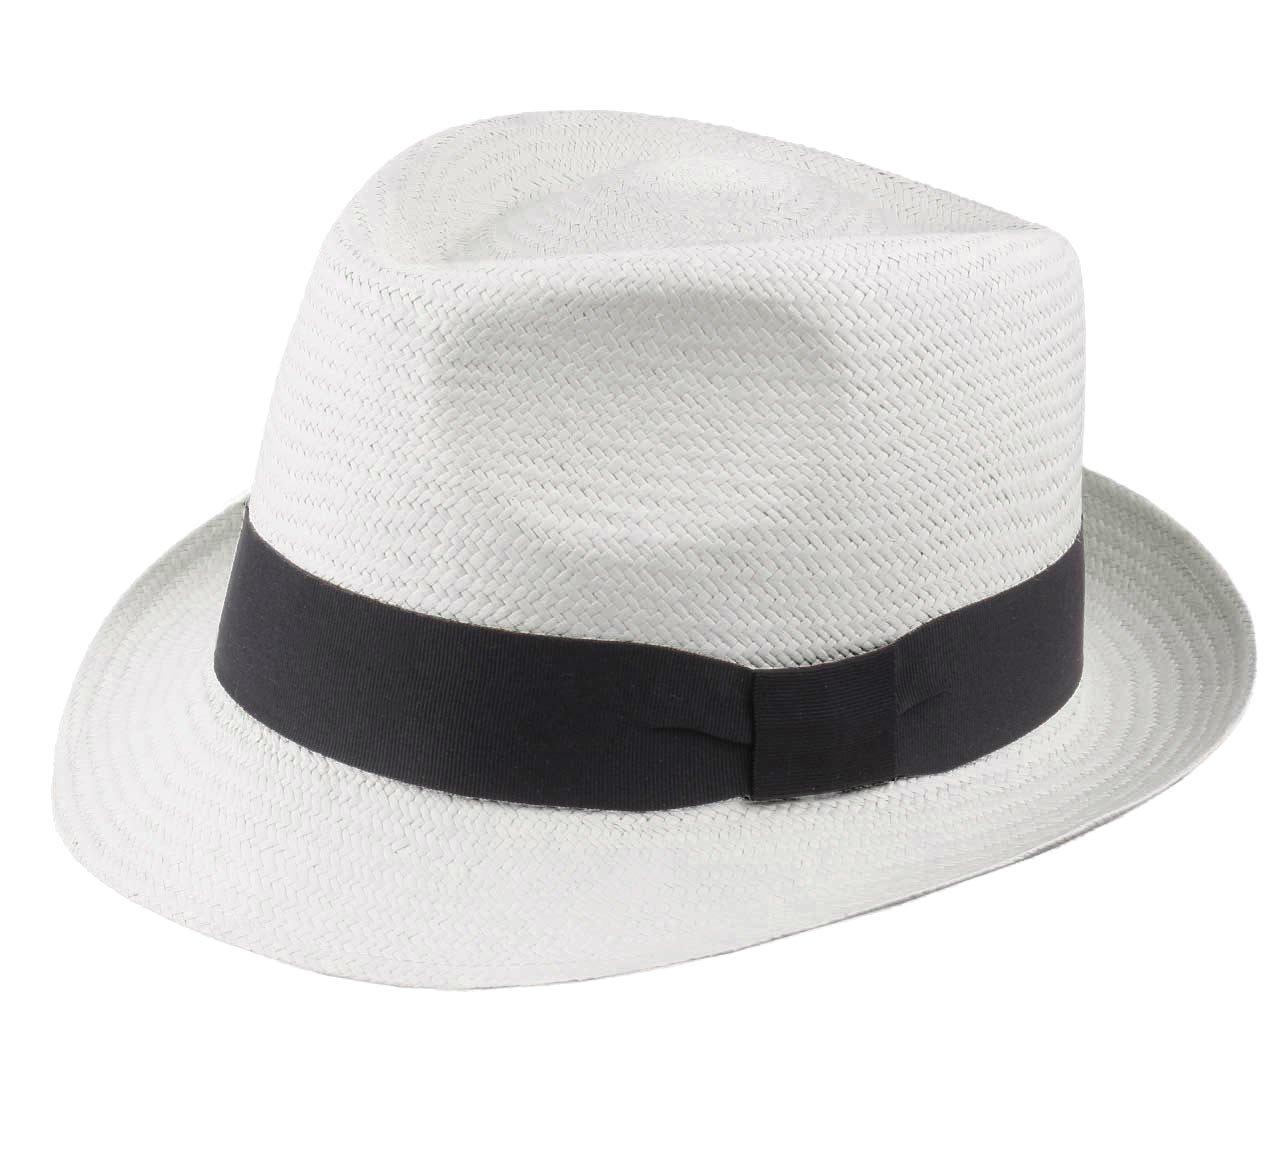 Classic Italy - Cappello Panama uomo Panama Cubano 964e44d5879a